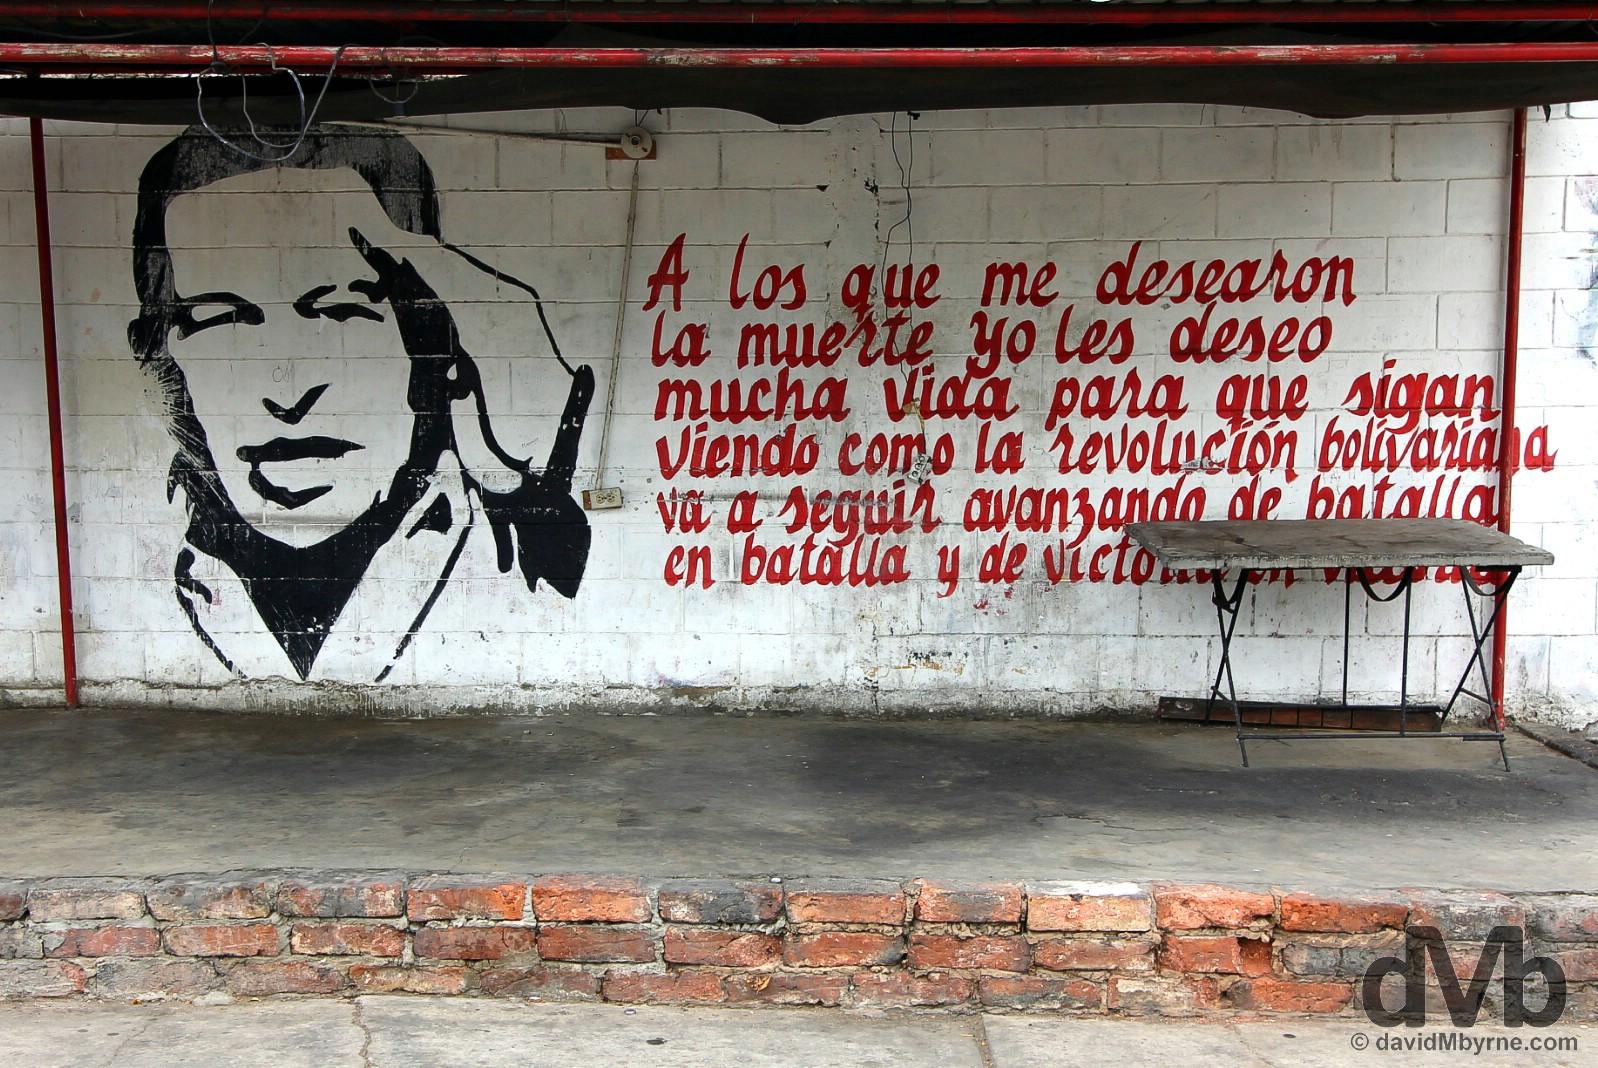 A Hugo Chavez mural on Avenida Padilla Calle 93, Maracaibo, Venezuela. June 22, 2015.